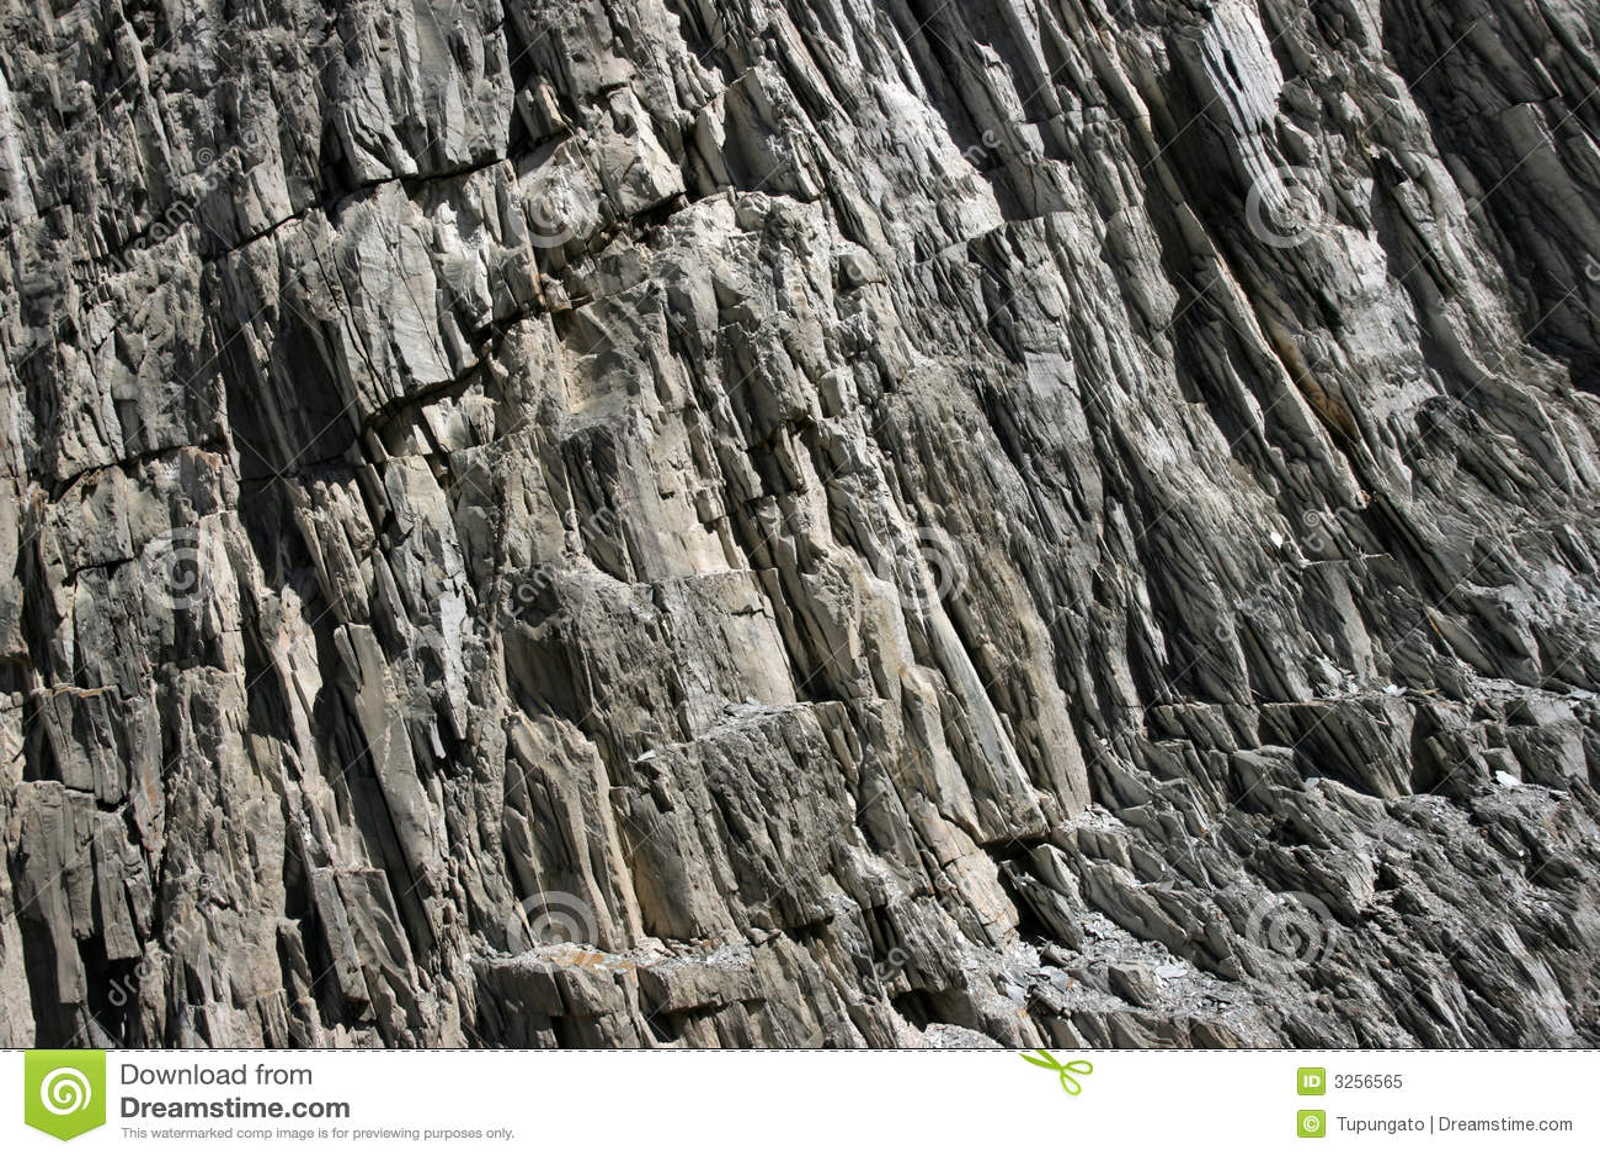 rocky mountains background royalty free stock photo